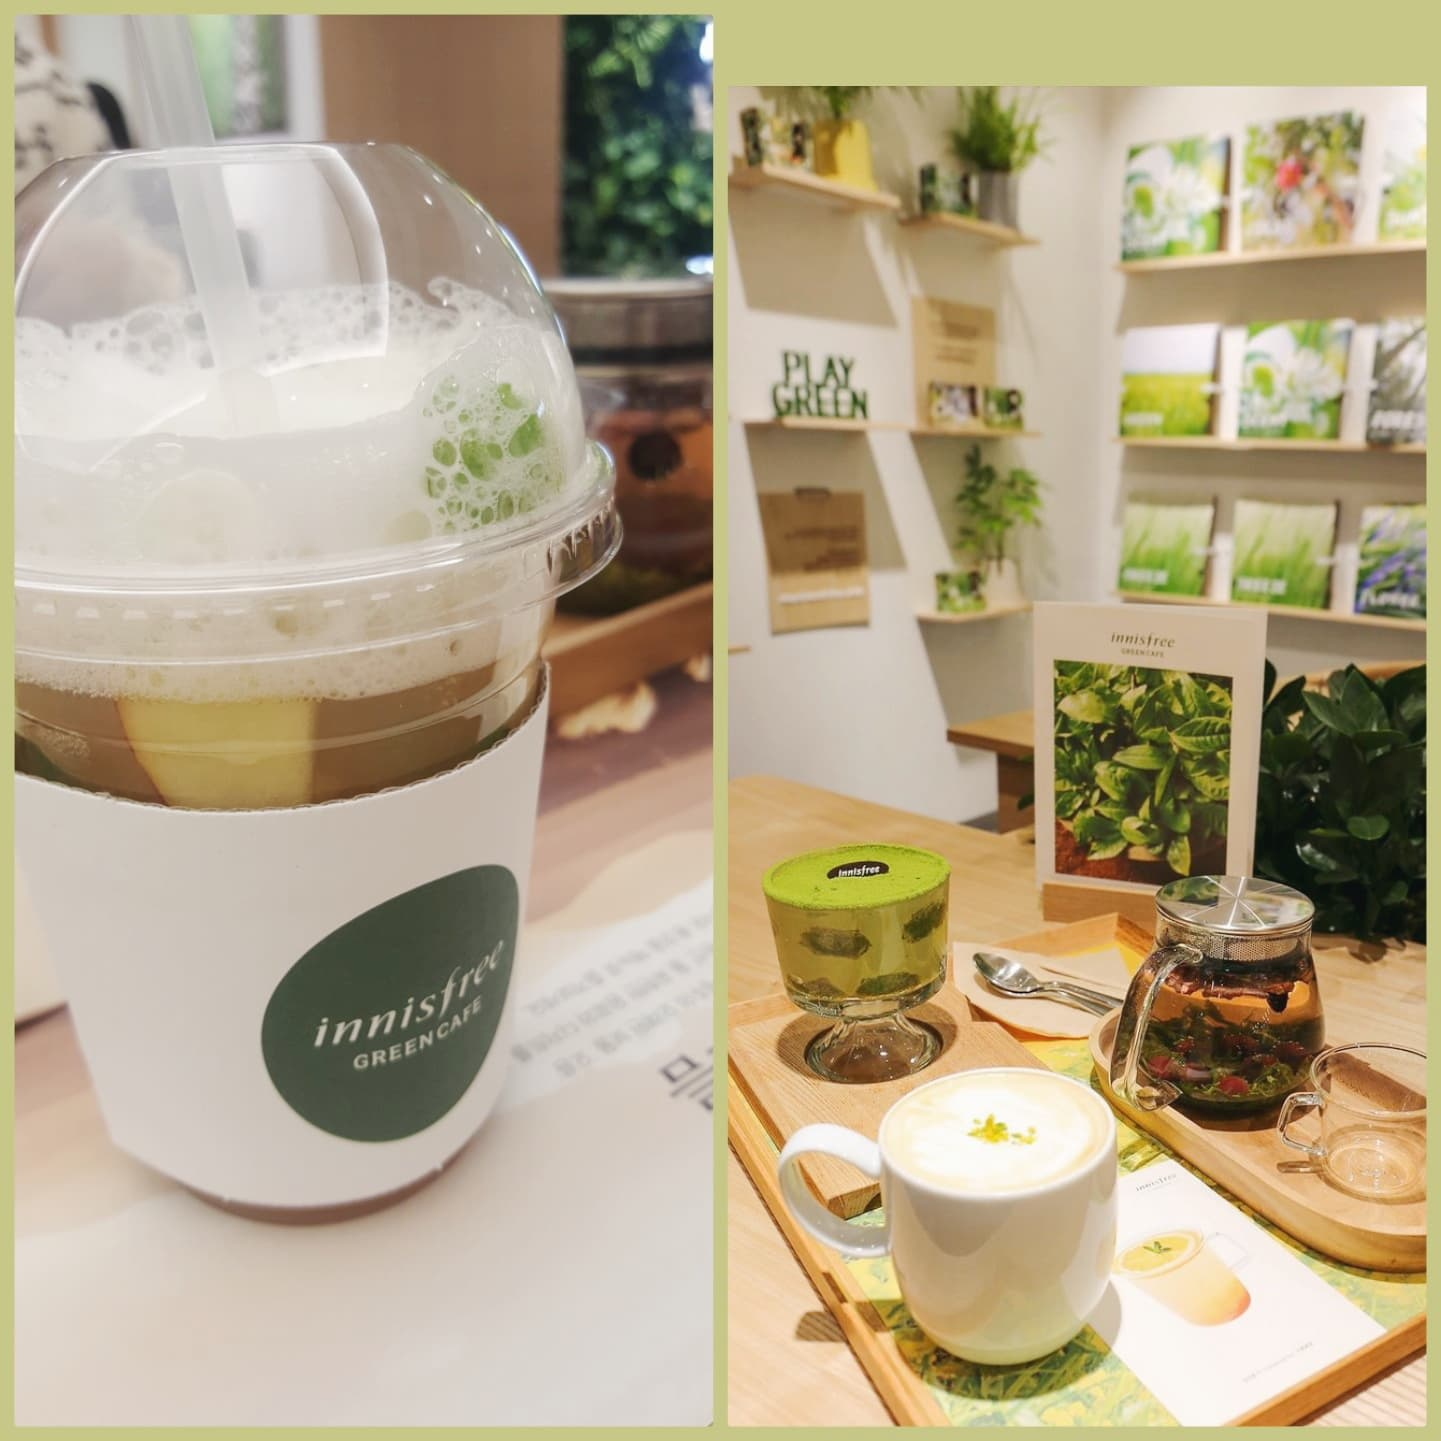 ăn gì ở seoul - innisfree green cafe